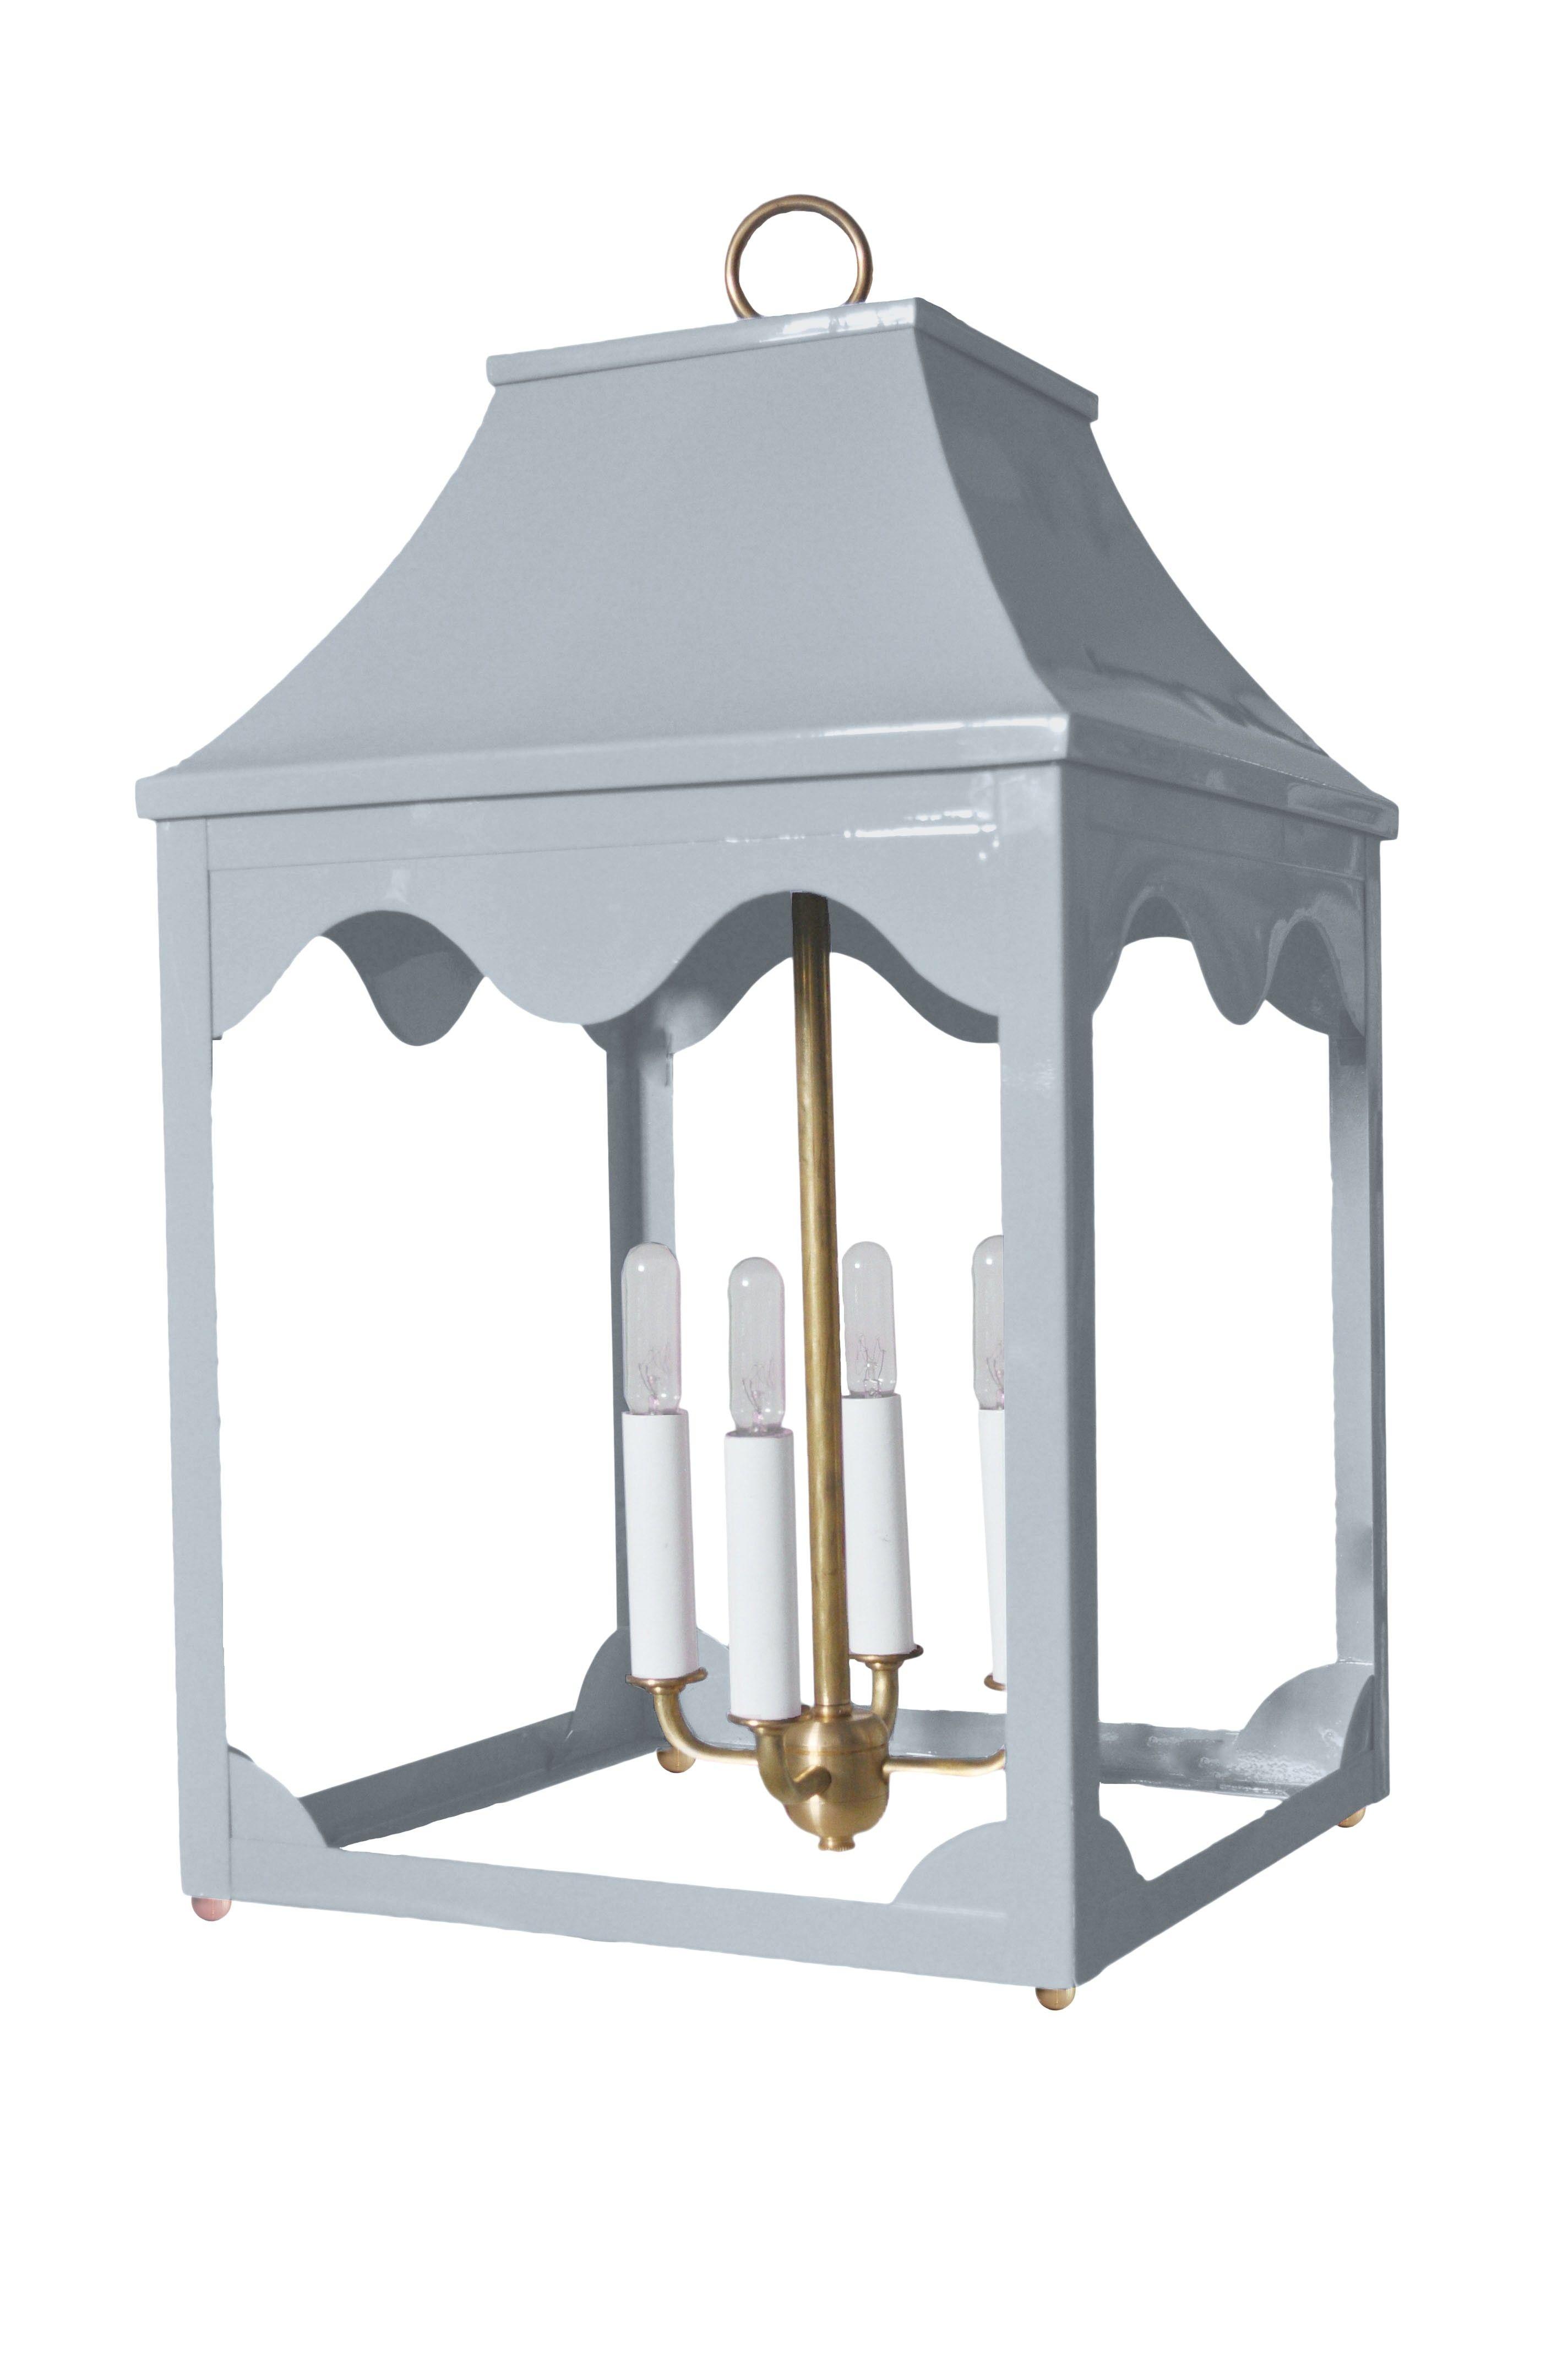 Oomph - hobe sound lantern- hinting blue   lighting   Pinterest ...